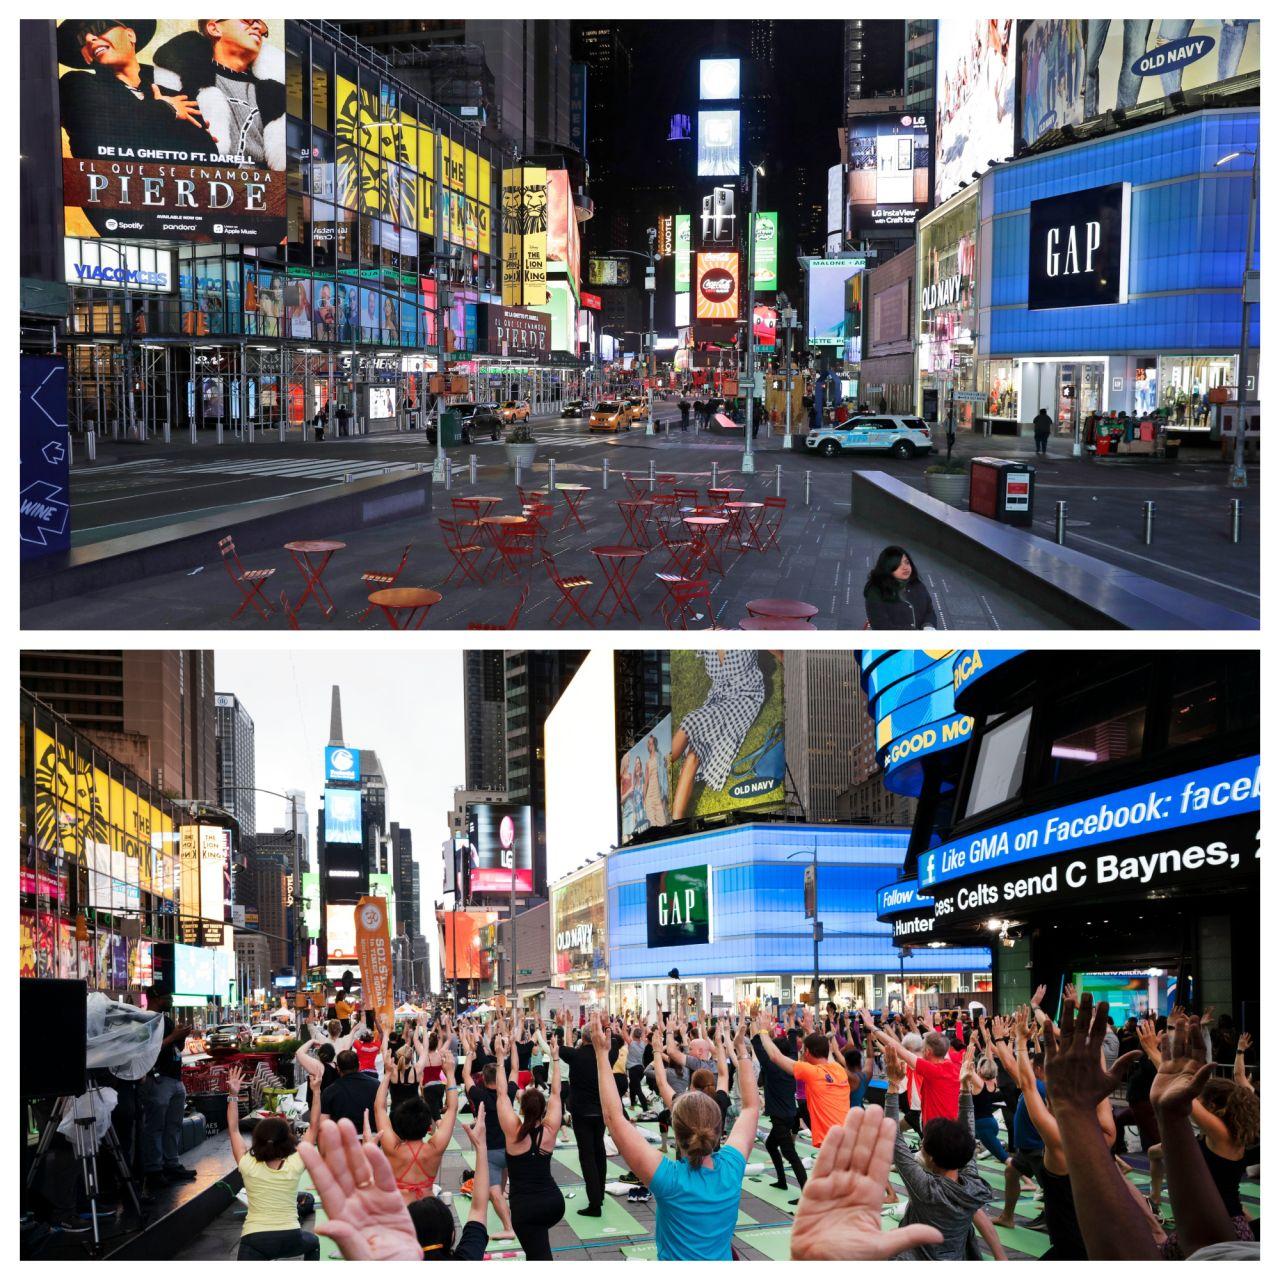 Statt Yoga mitten im Trubel des New Yorker Times Square ist dort aktuell kaum jemand unterwegs.